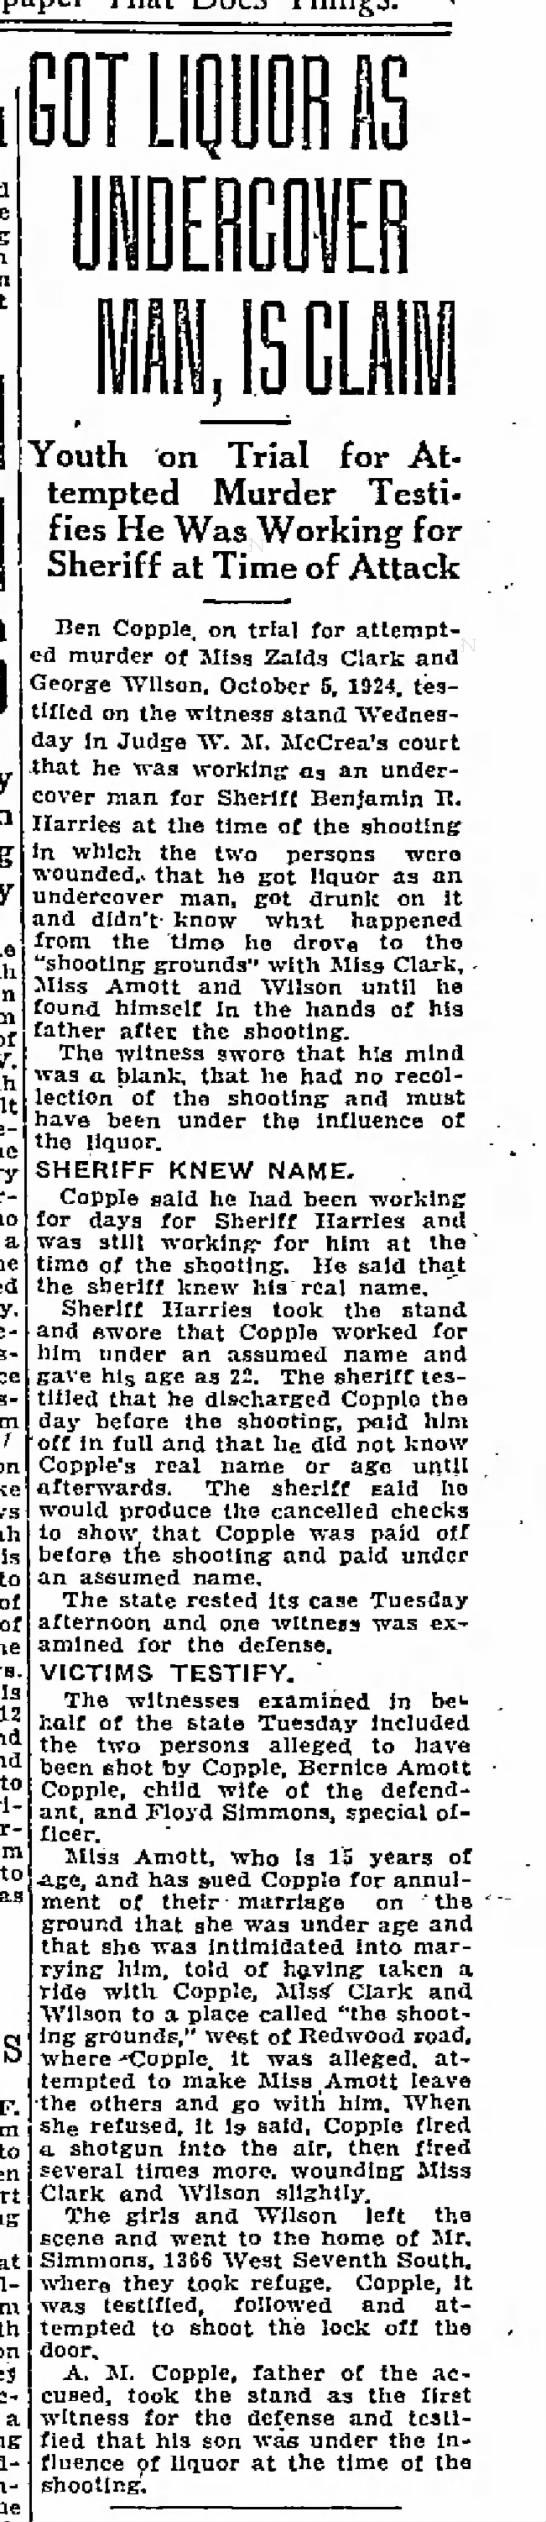 Benjamin Garl Copple attempted murder